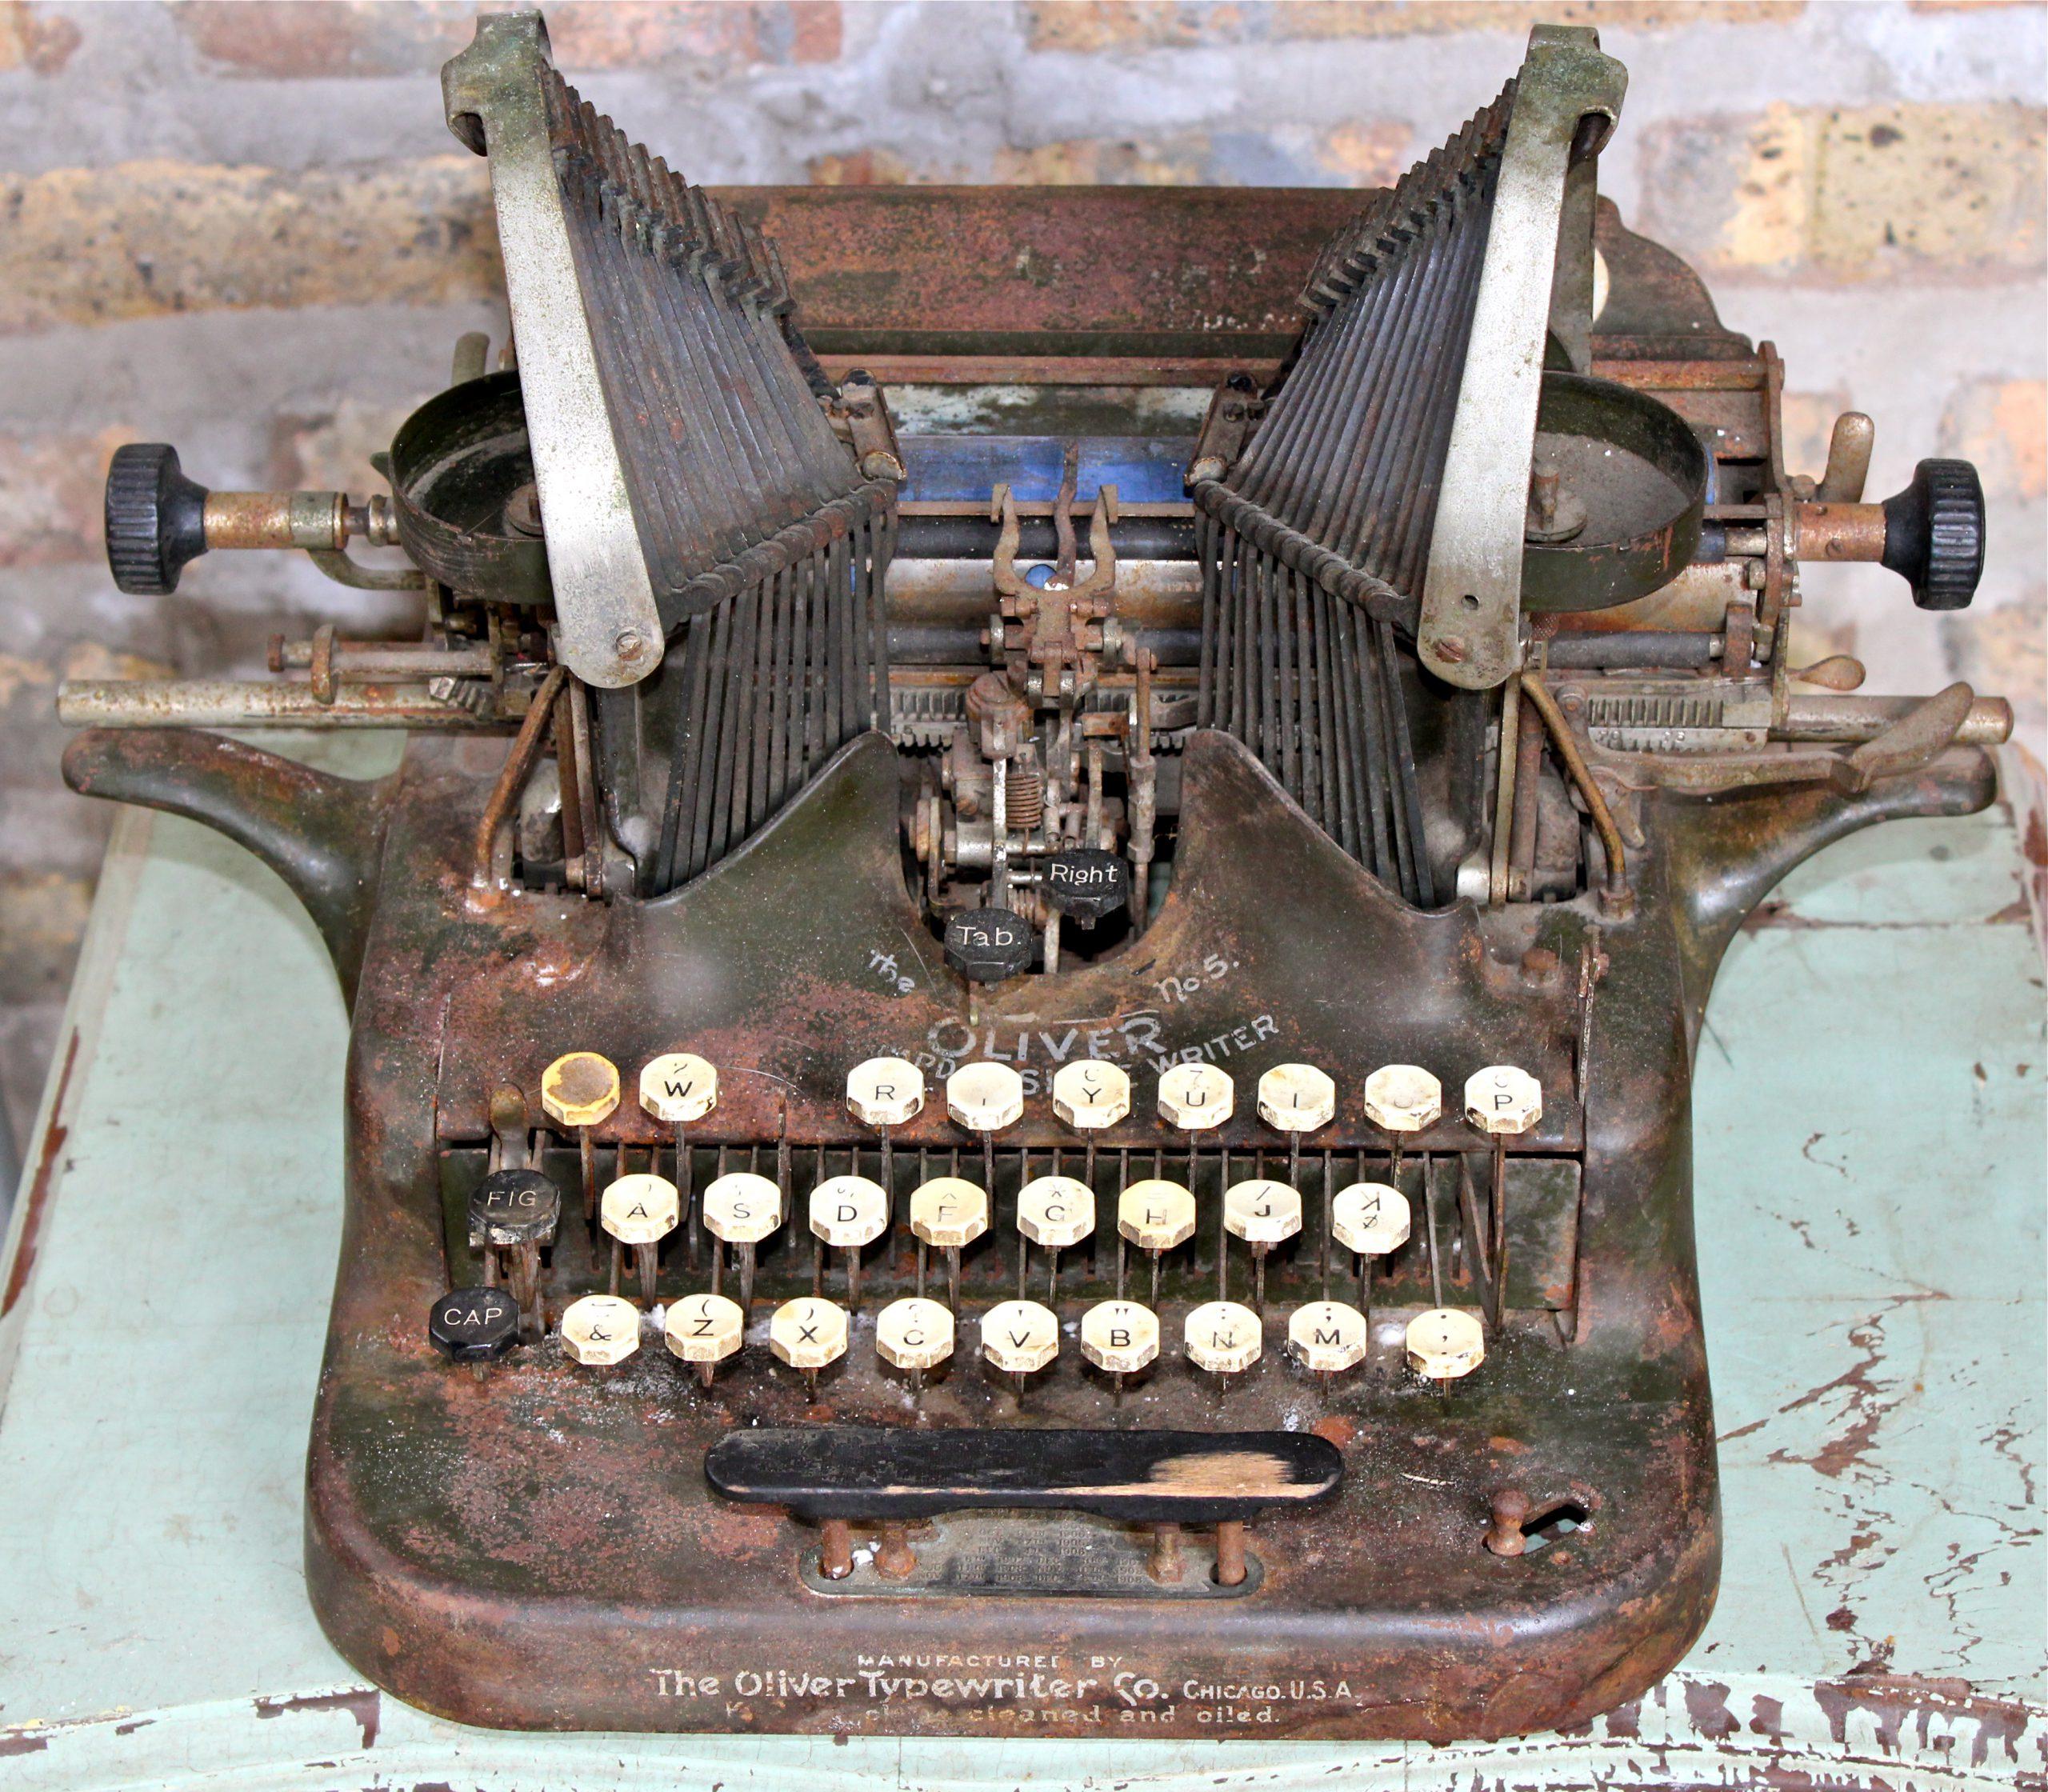 Oliver Typewriter No. 5 by Oliver Typewriter Co., c. 1910